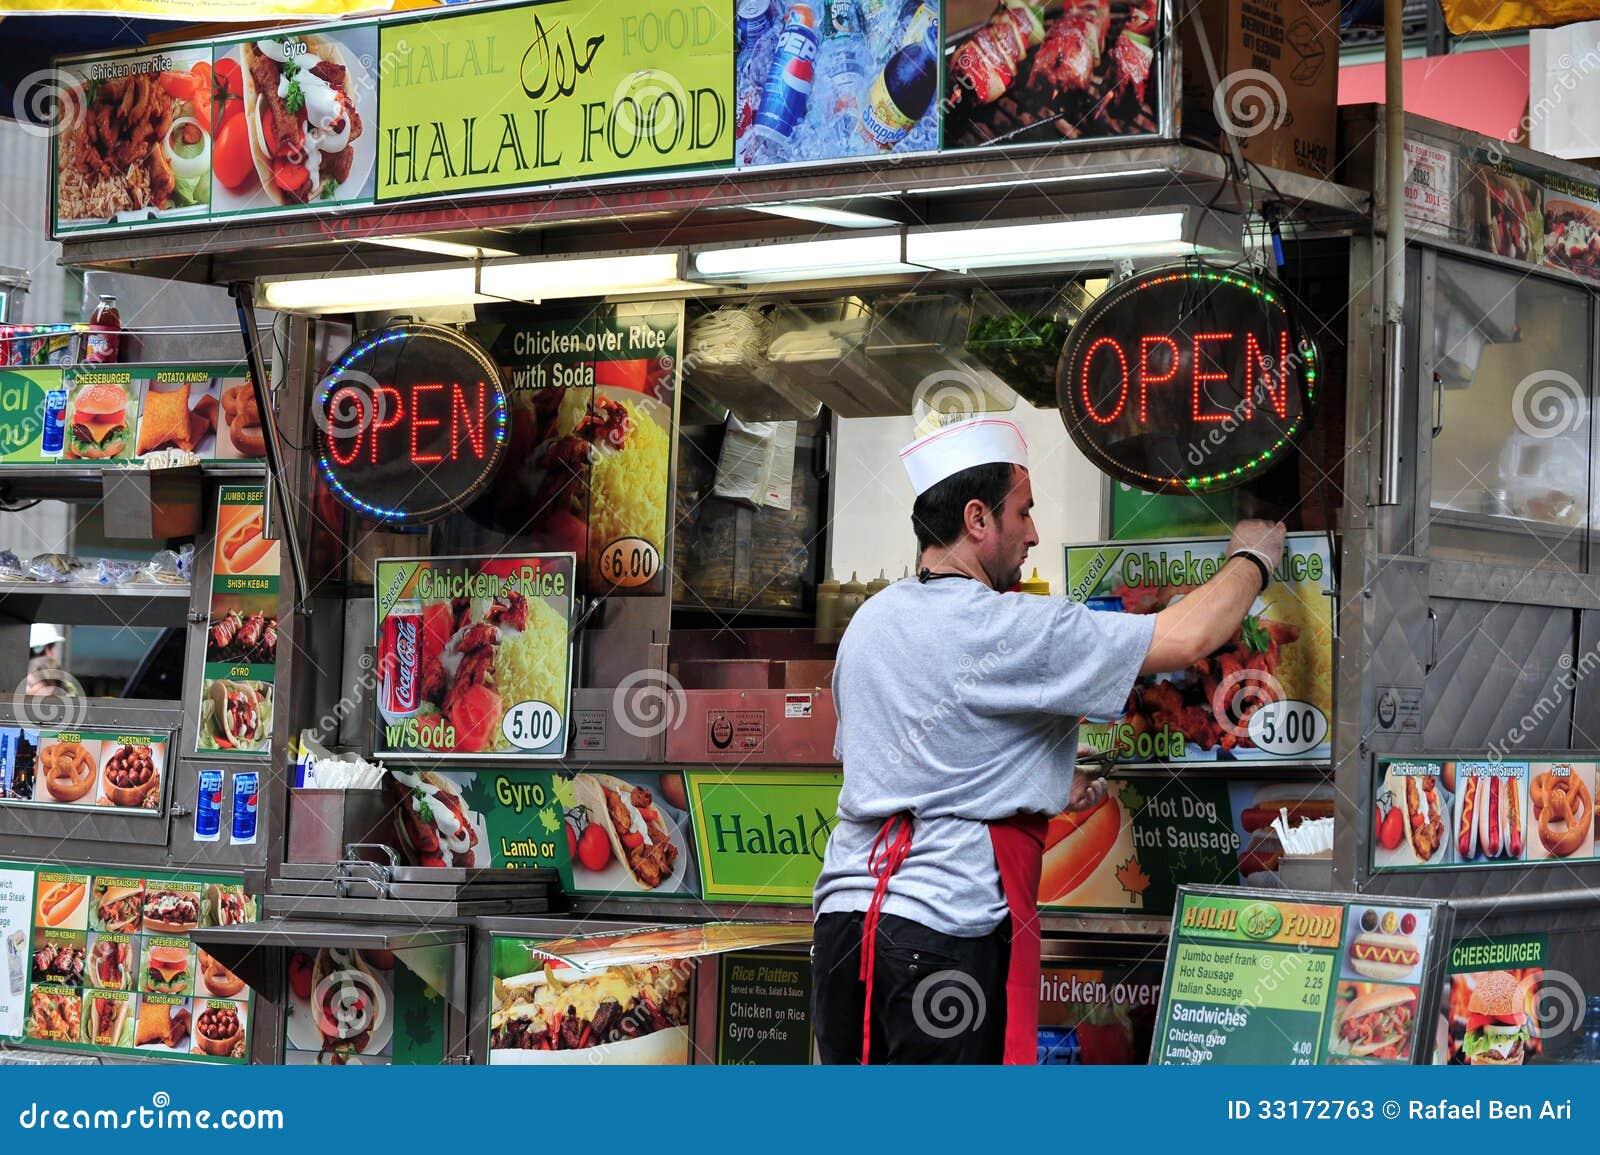 New York Fast Food Law